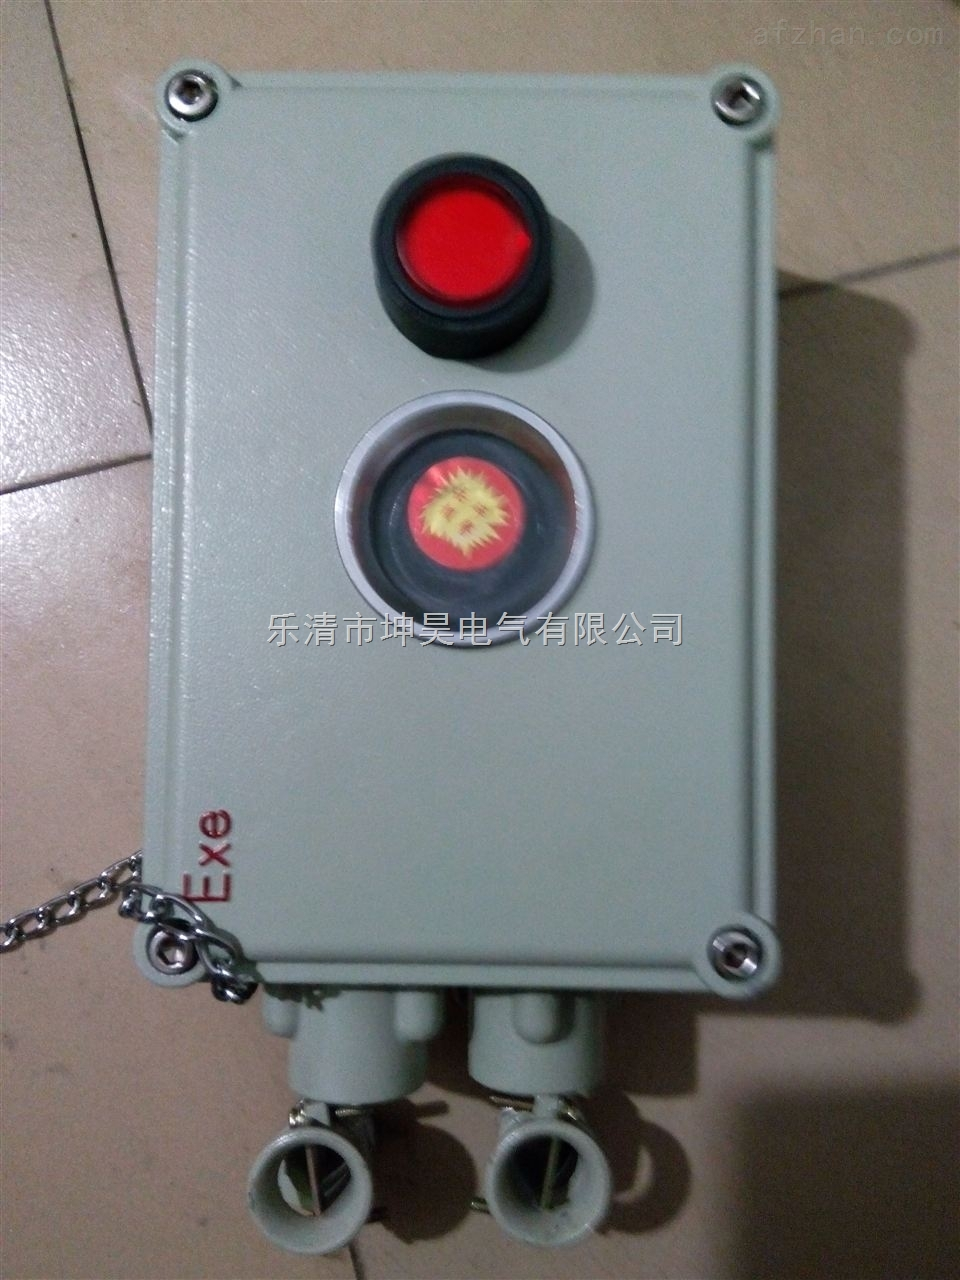 bxn-2双回路/防爆消防火灾/报警按钮